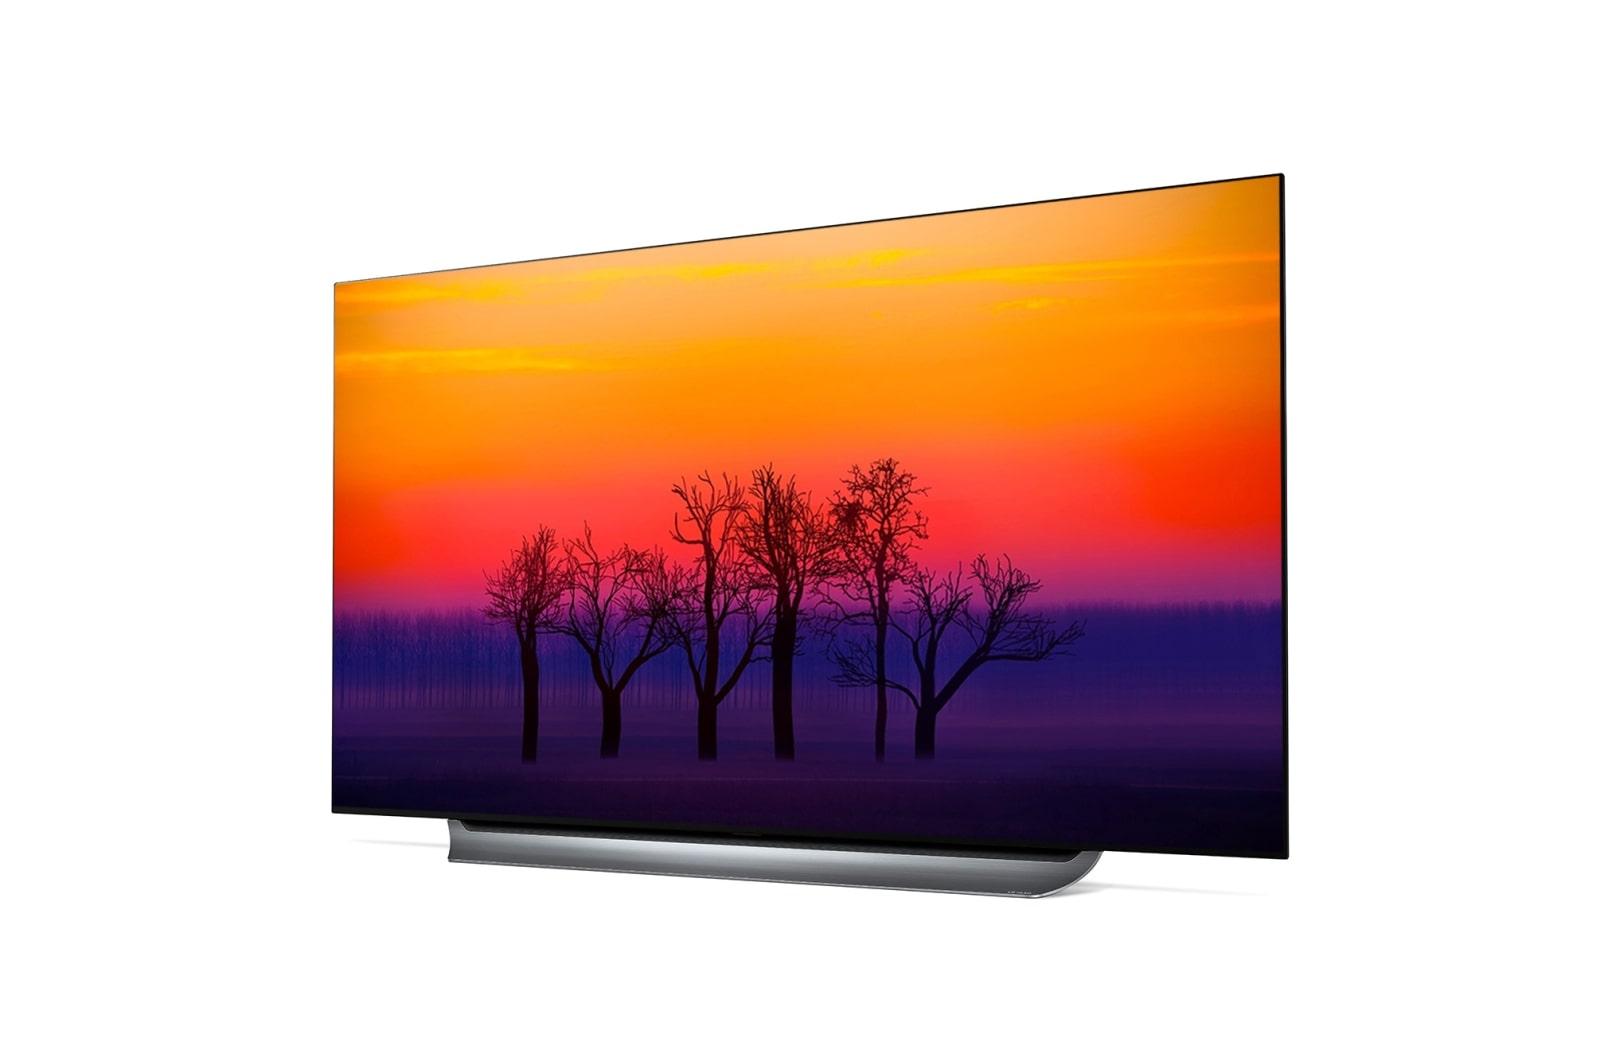 LG 65 Inches Ultra HD (4K) OLED Smart TV (OLED65C8PTA)